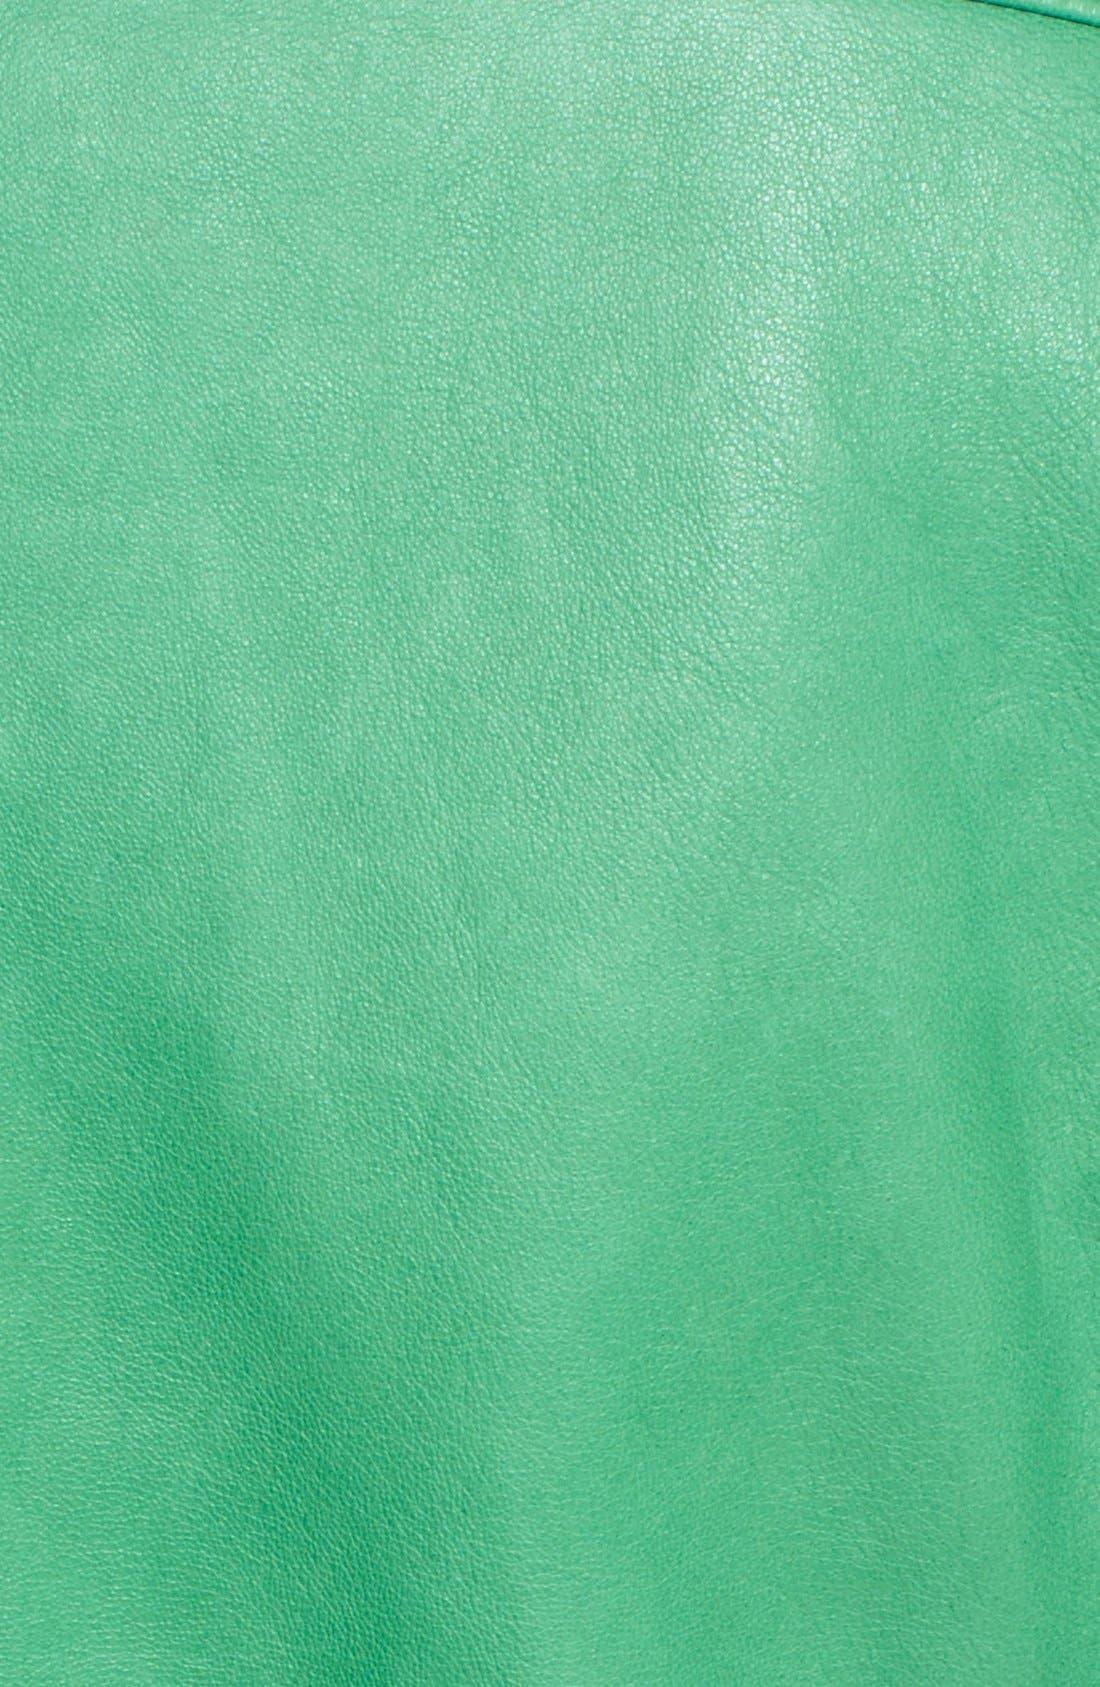 Alternate Image 3  - Tomas Maier Nappa Leather Moto Jacket